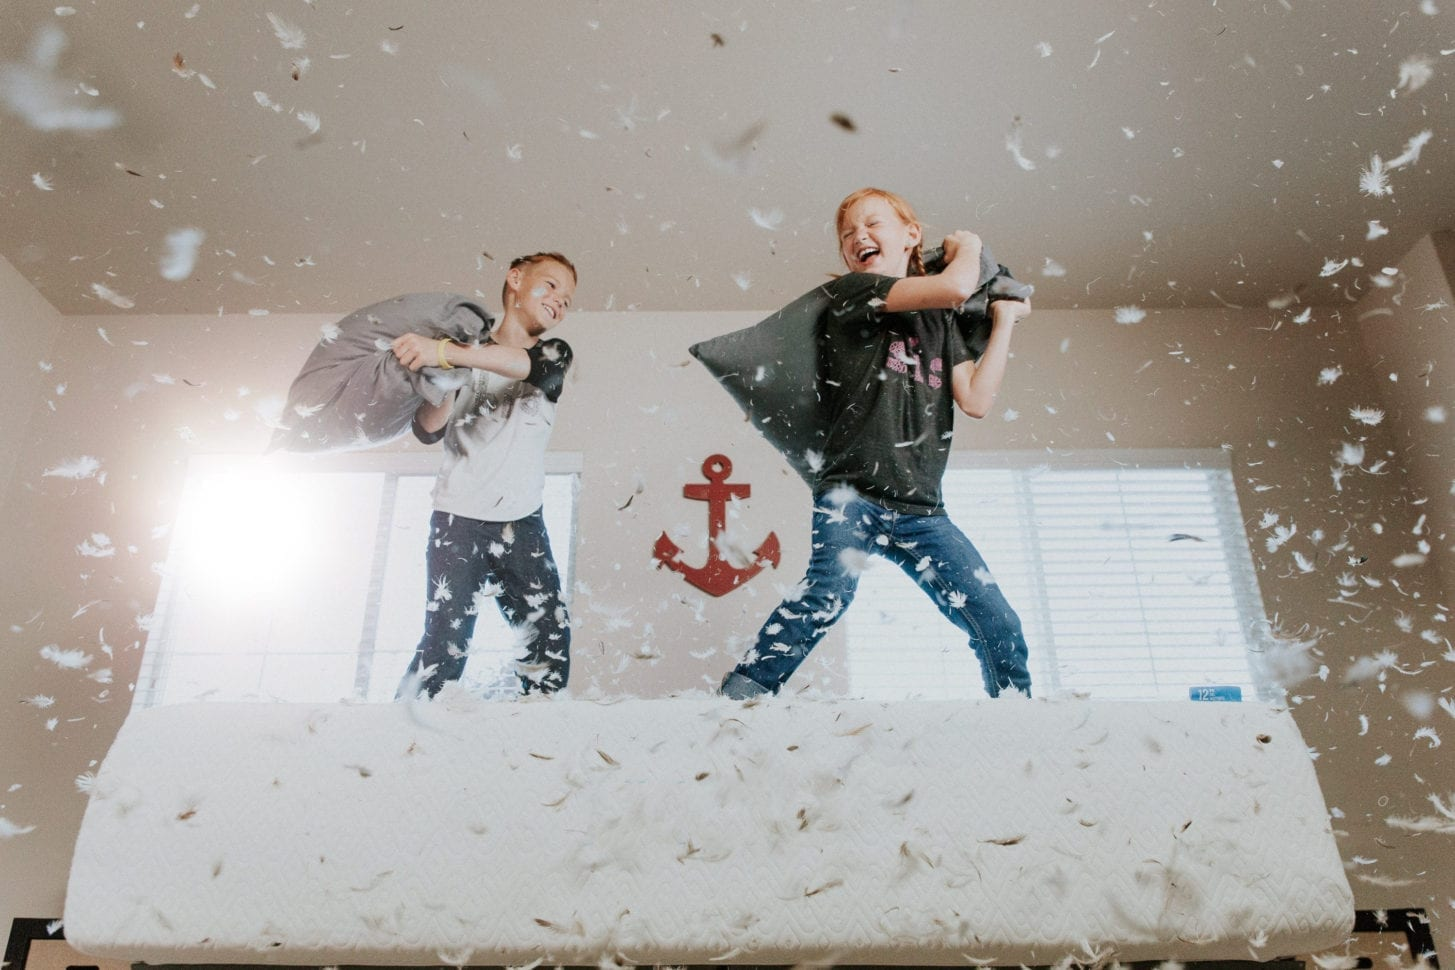 North Carolina Child Support Guidelines